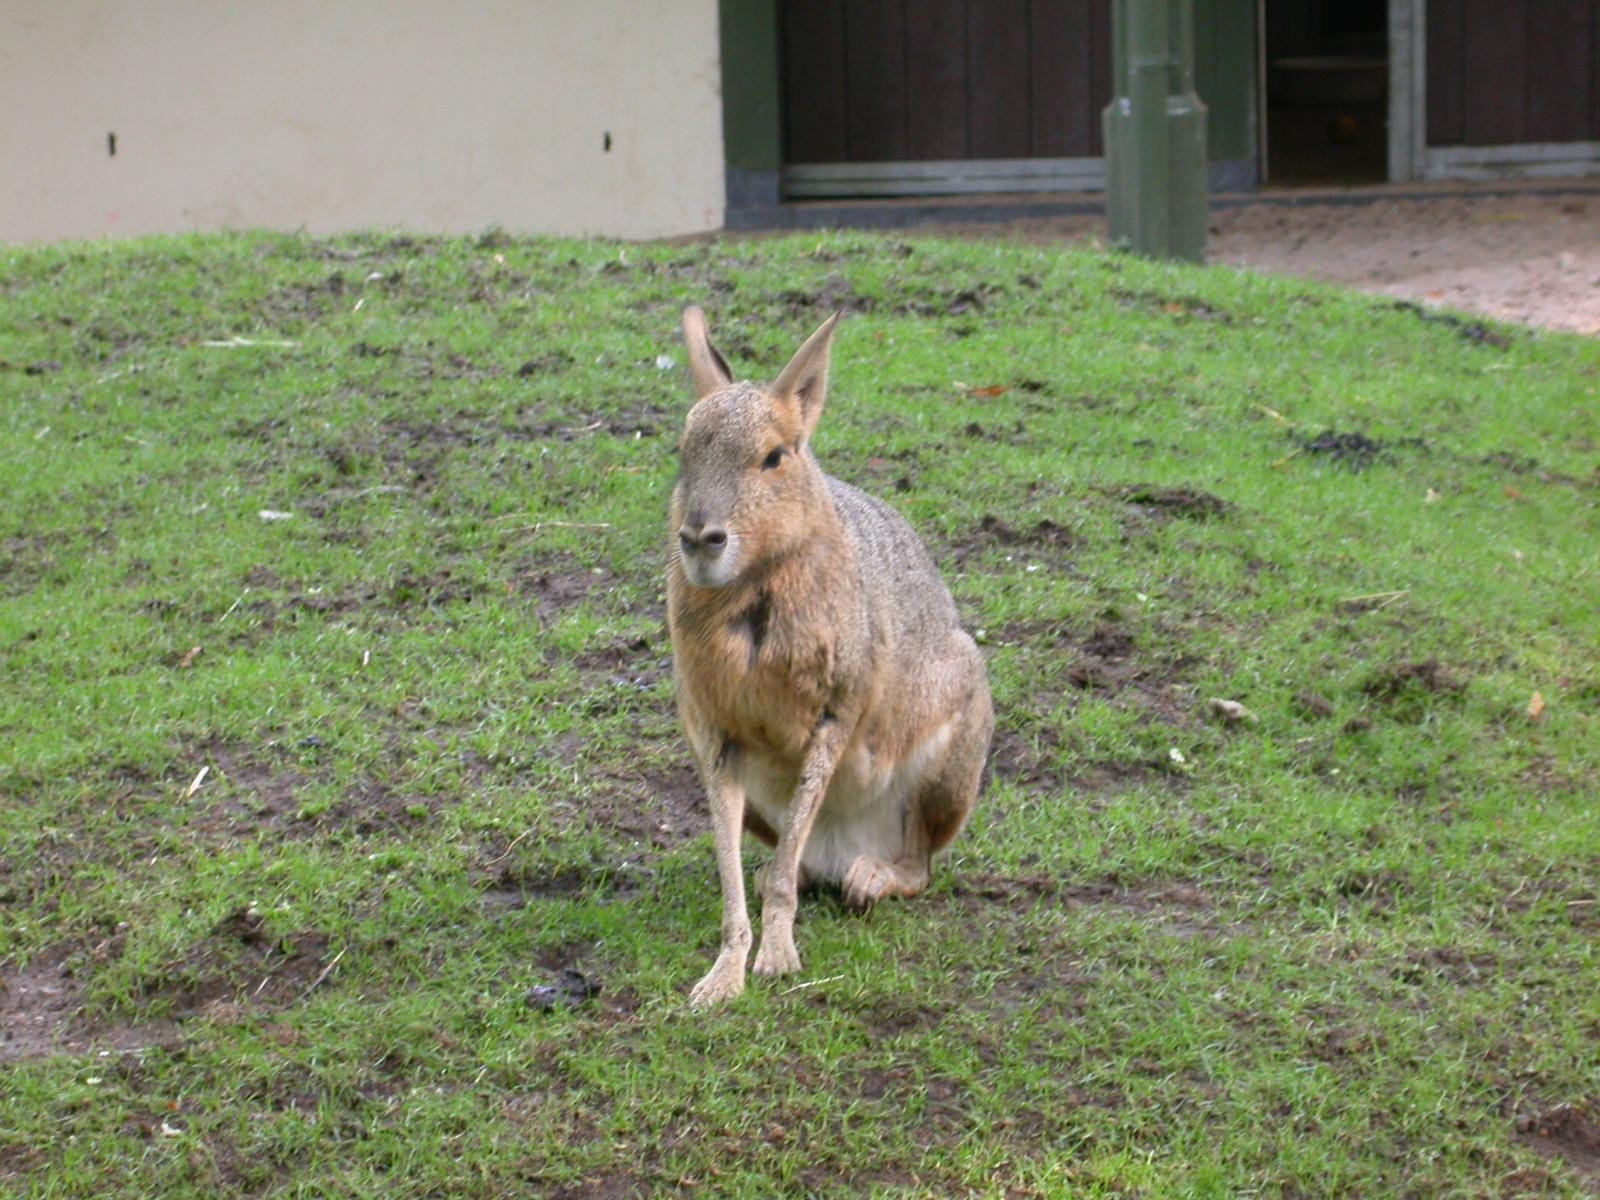 eva rabbit like mammal sitting on grass fur soft royalty-free